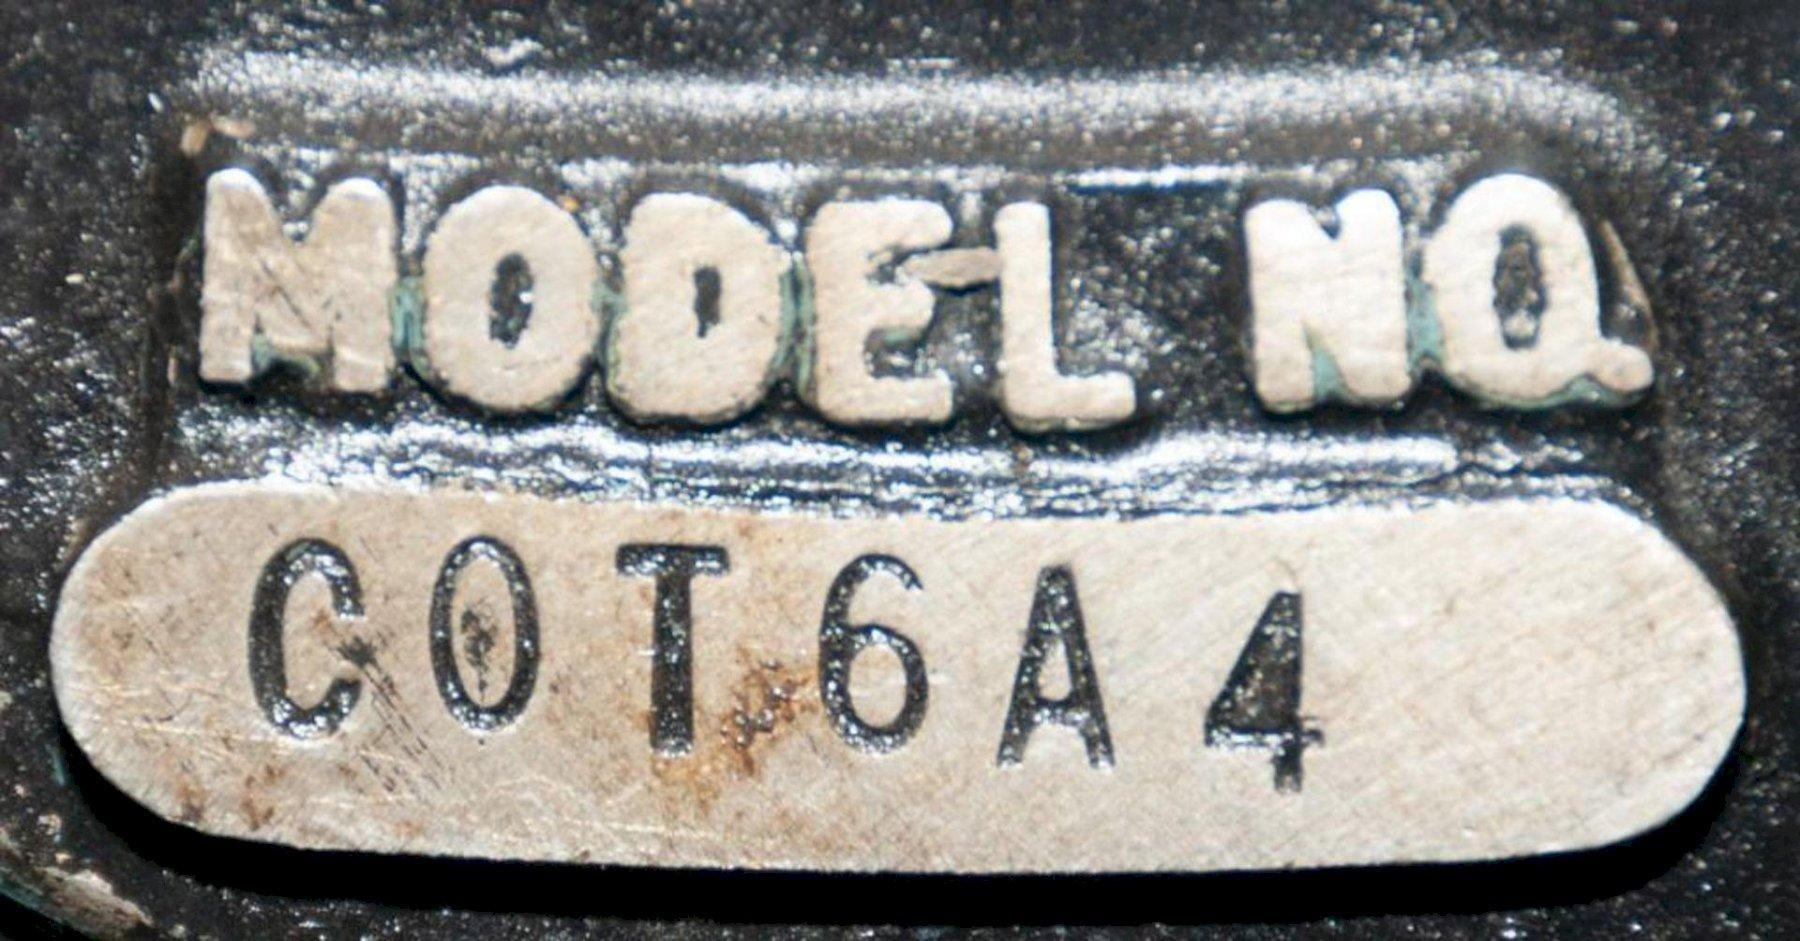 TISHKEN MODEL #COR6A4 6-WAY ADJUSTABLE CUTOFF PRESS: STOCK #15341